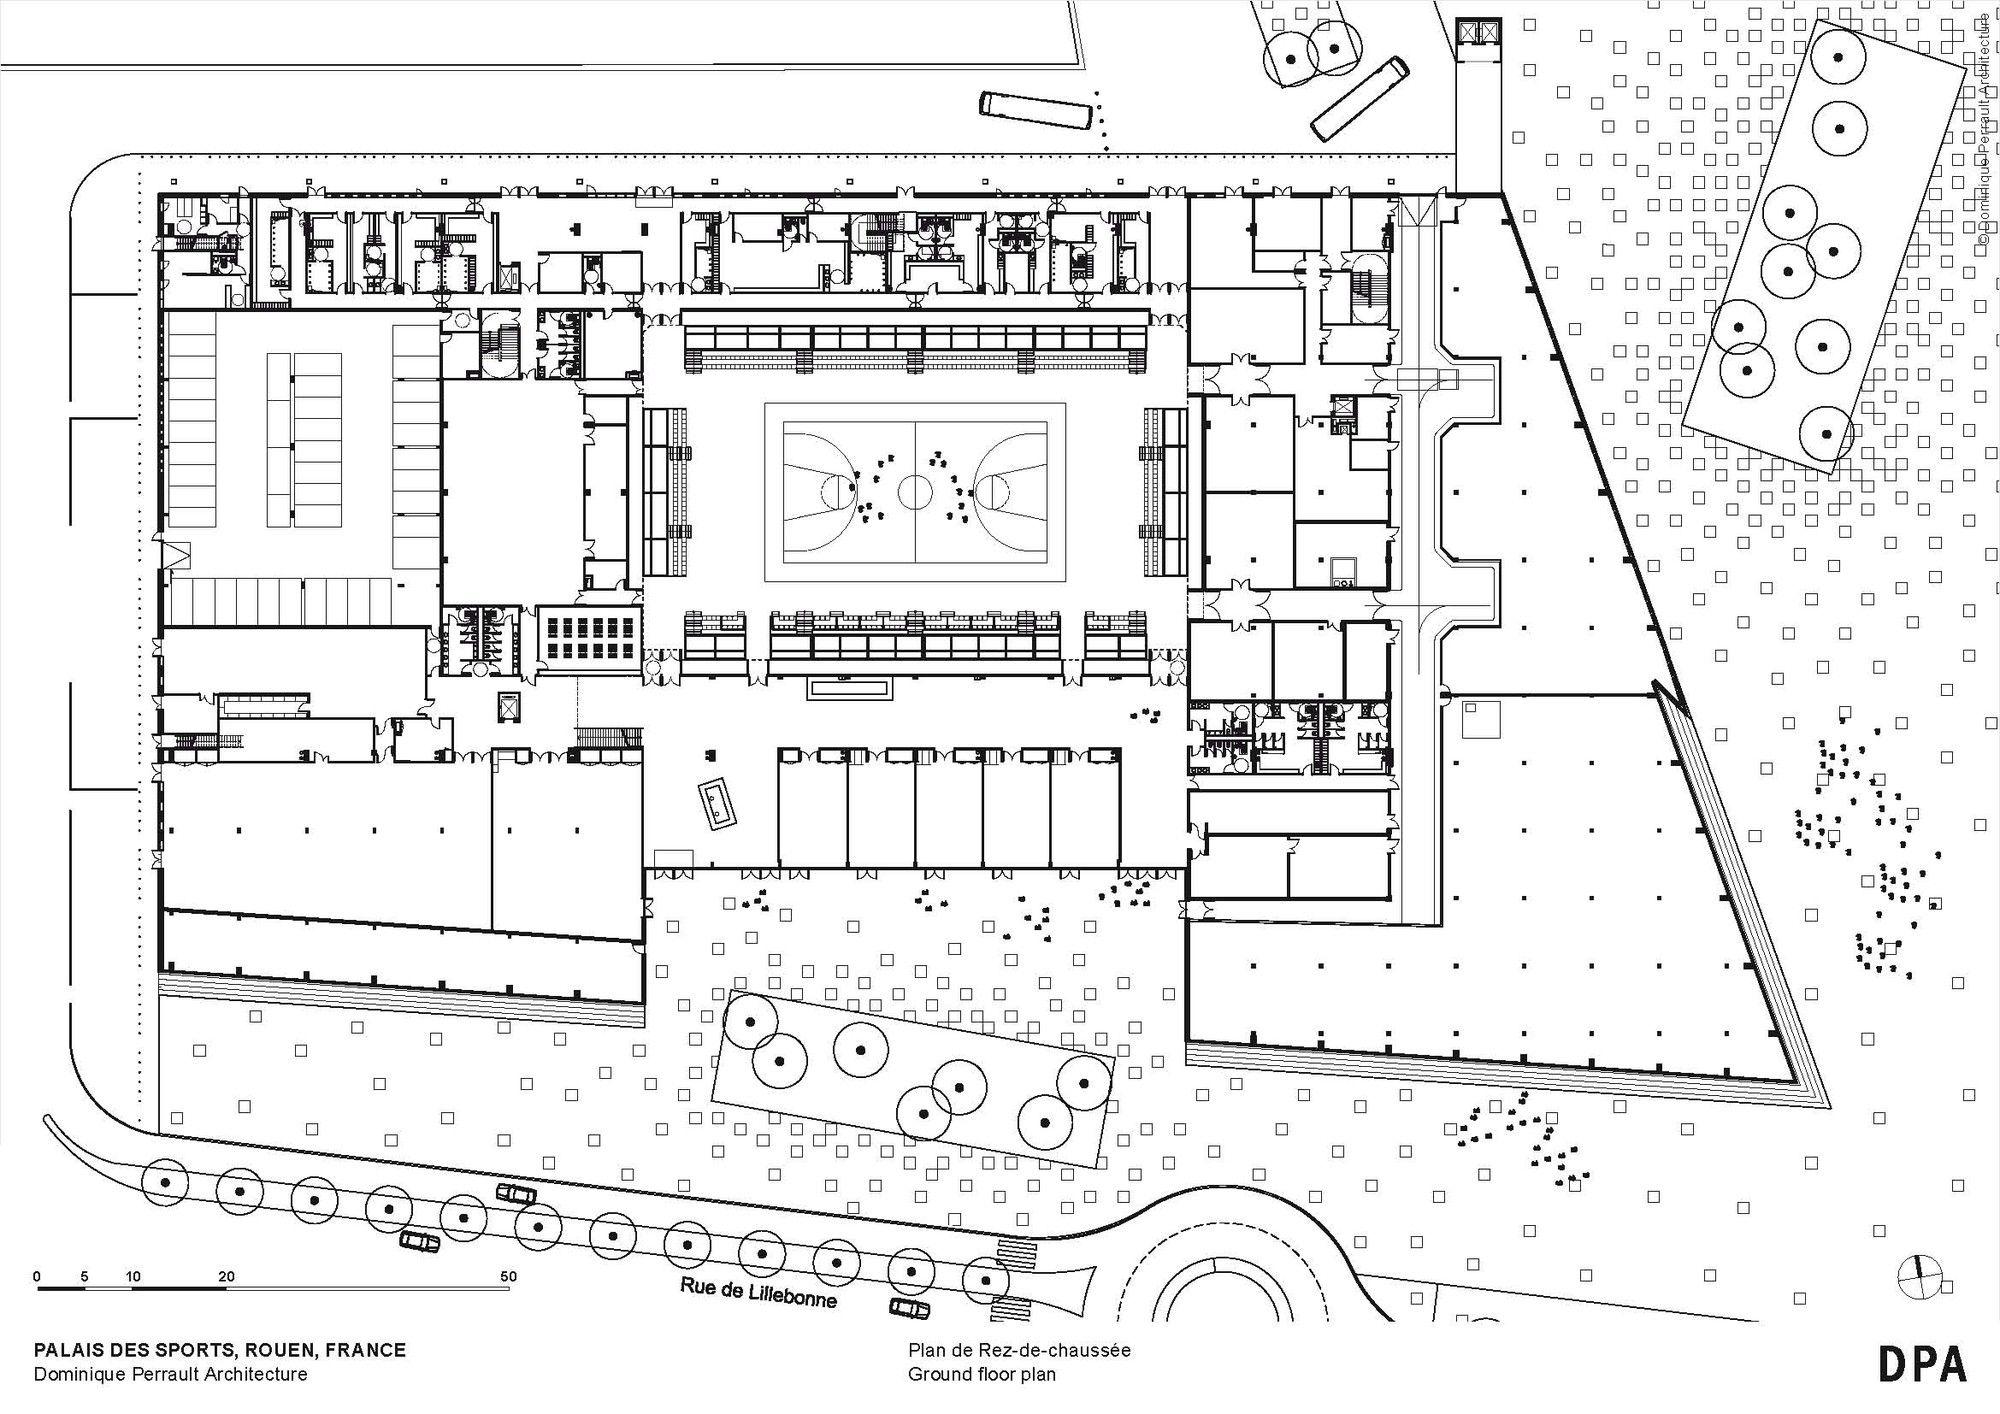 galer a de palacio de deportes de rouen dominique perrault architecture 26 deportes. Black Bedroom Furniture Sets. Home Design Ideas